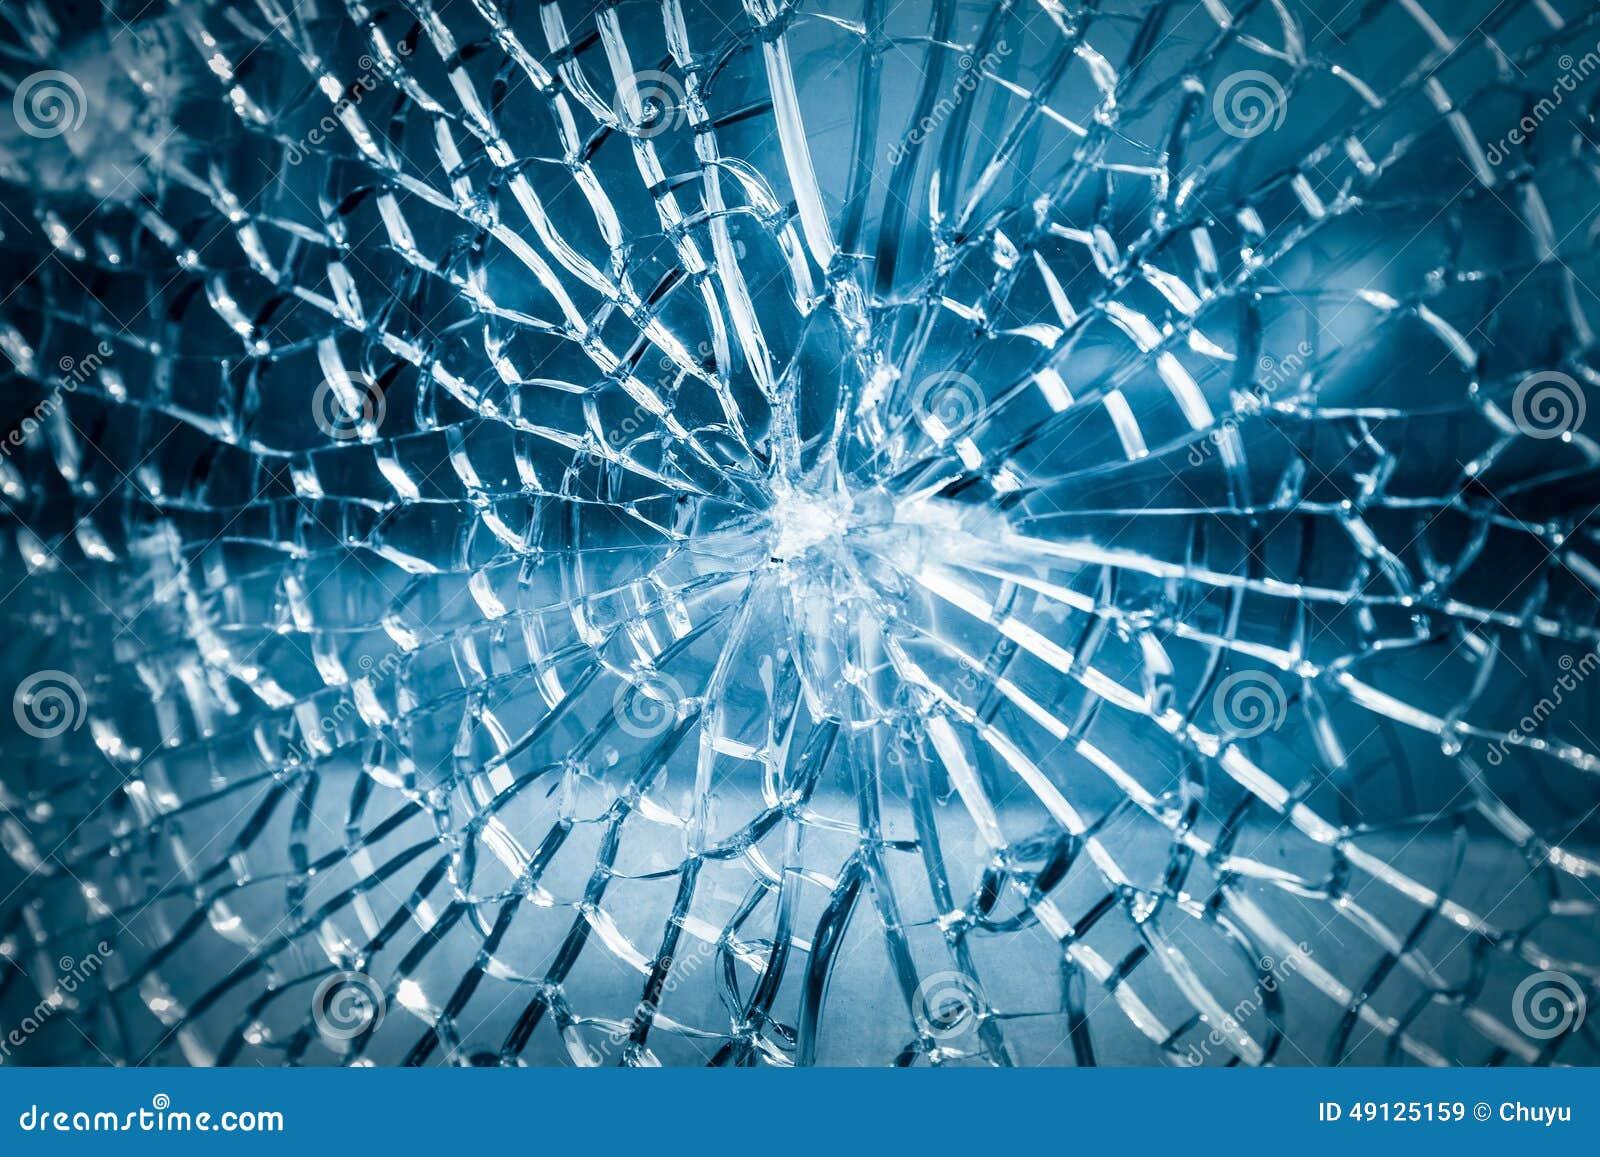 M Safety Glass